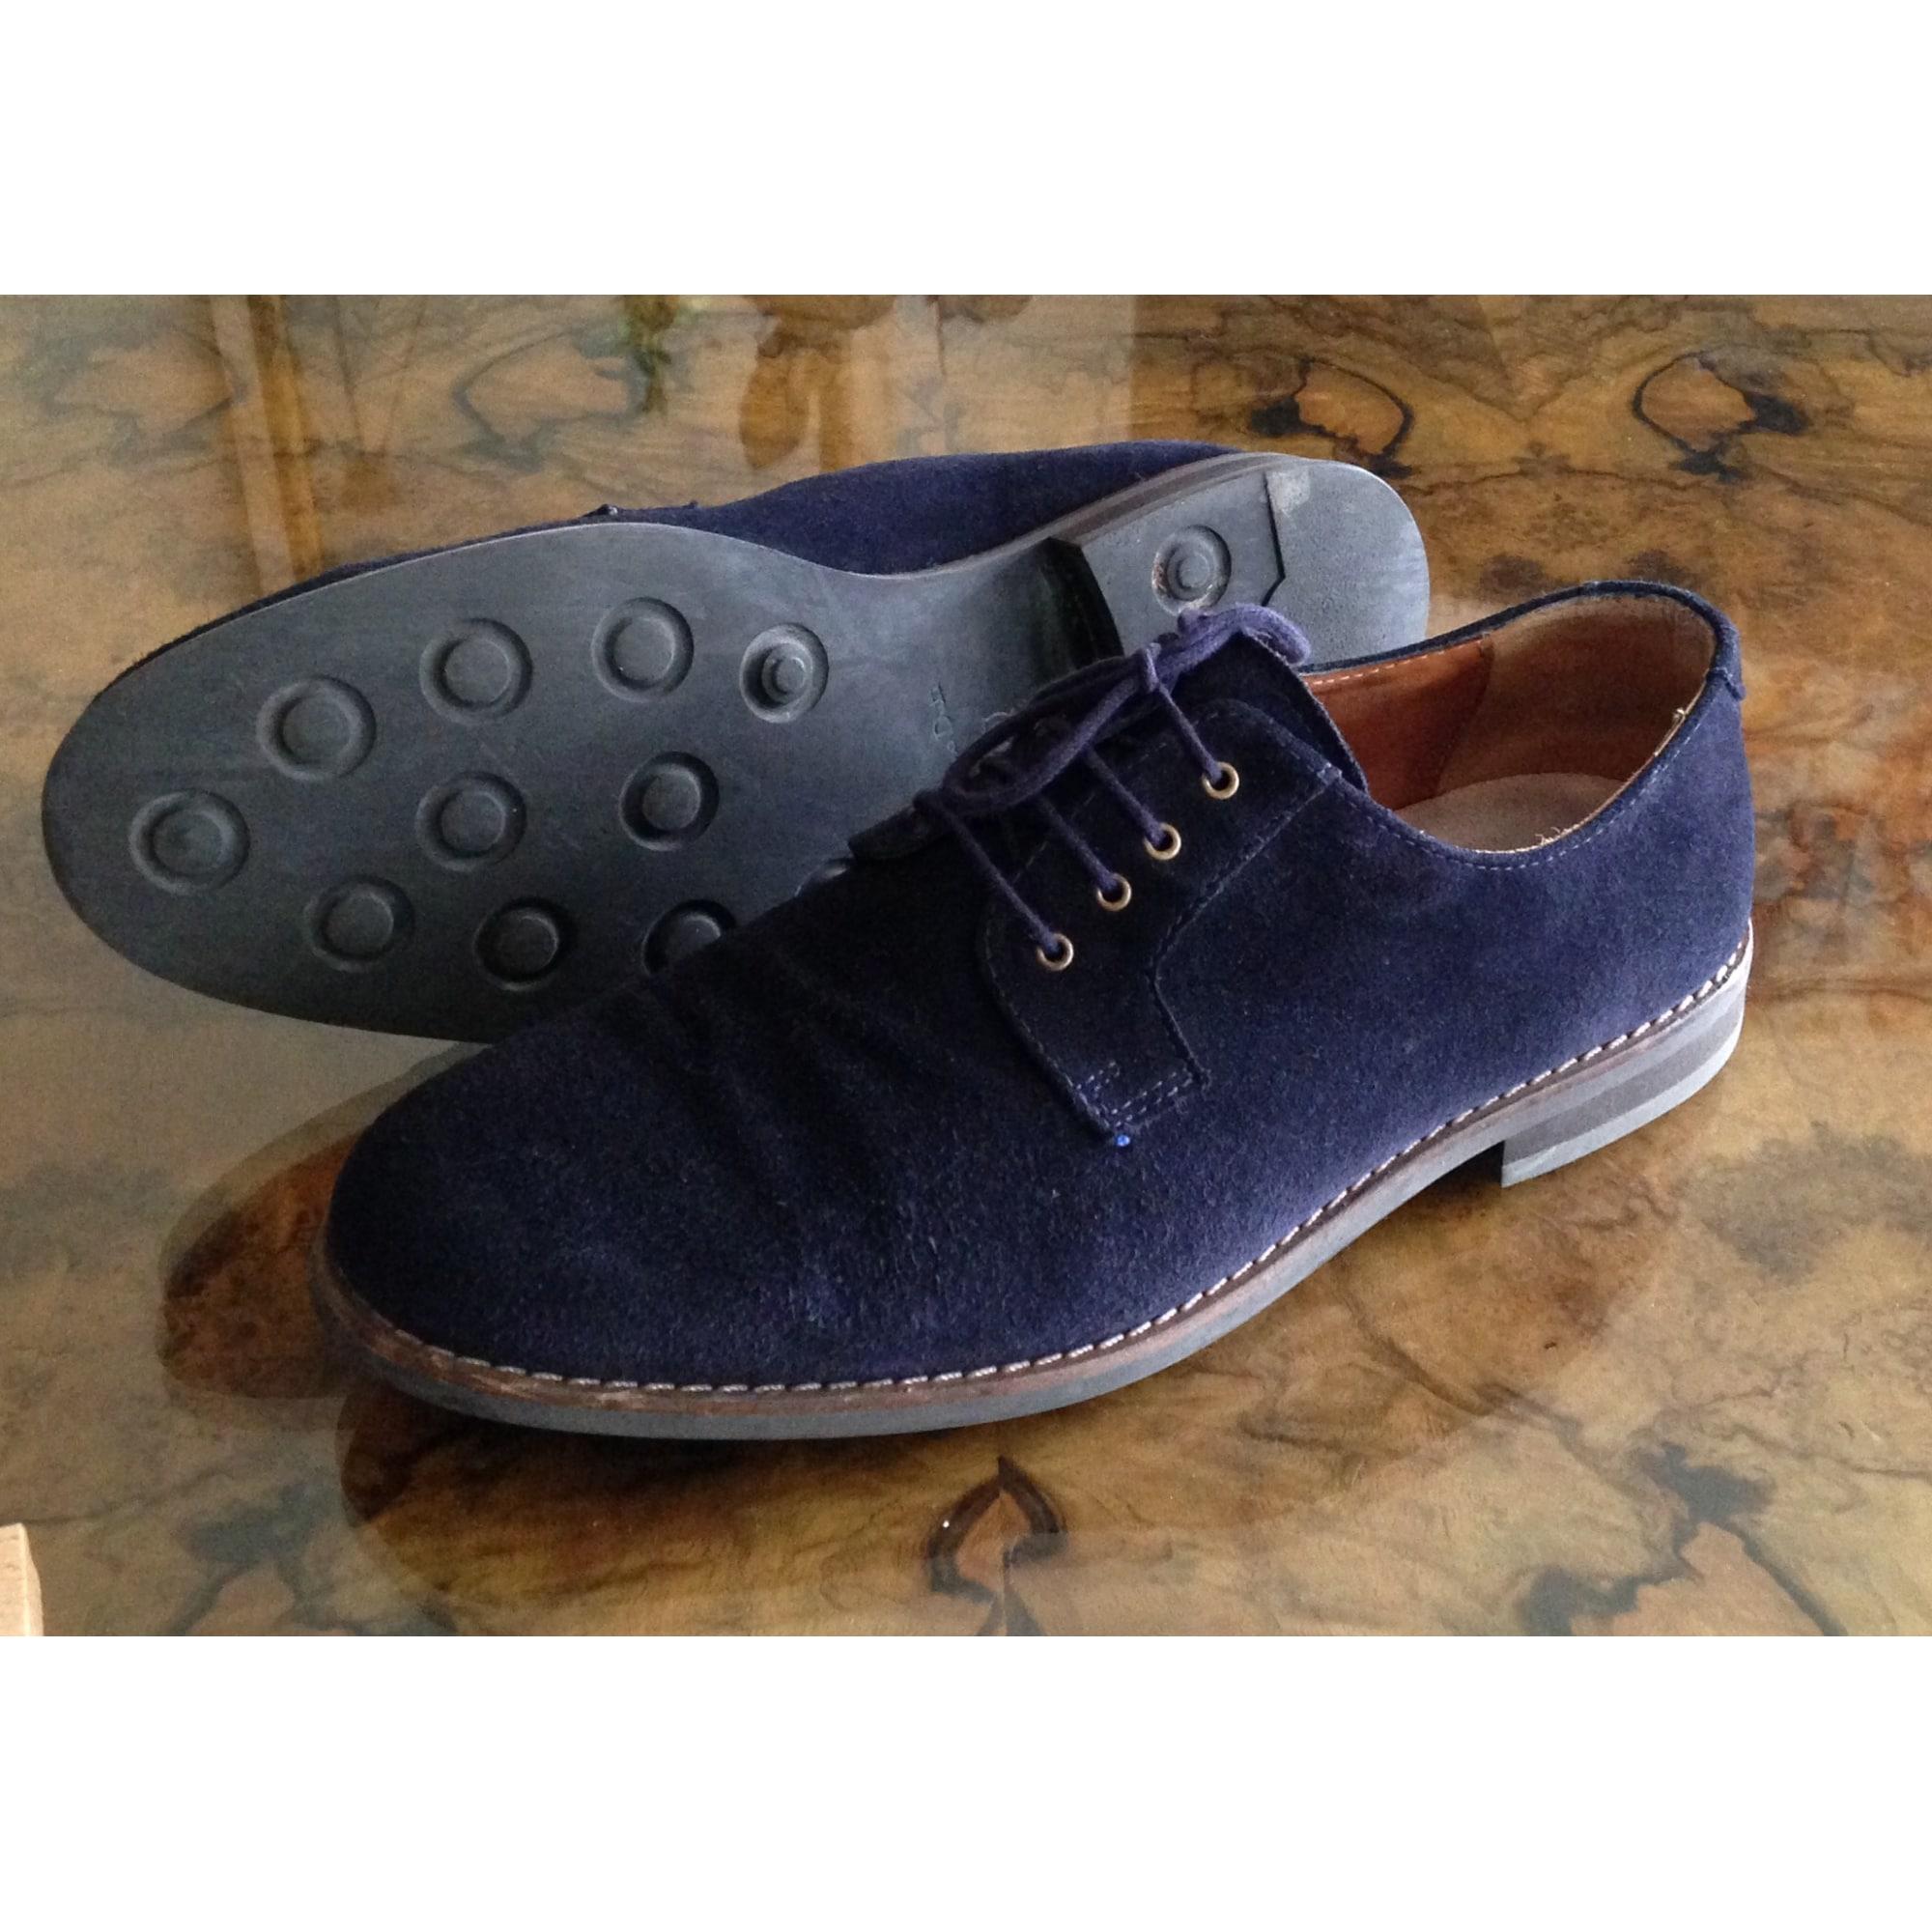 Chaussures à lacets MASSIMO DUTTI cuir noir 41 65ifwmX